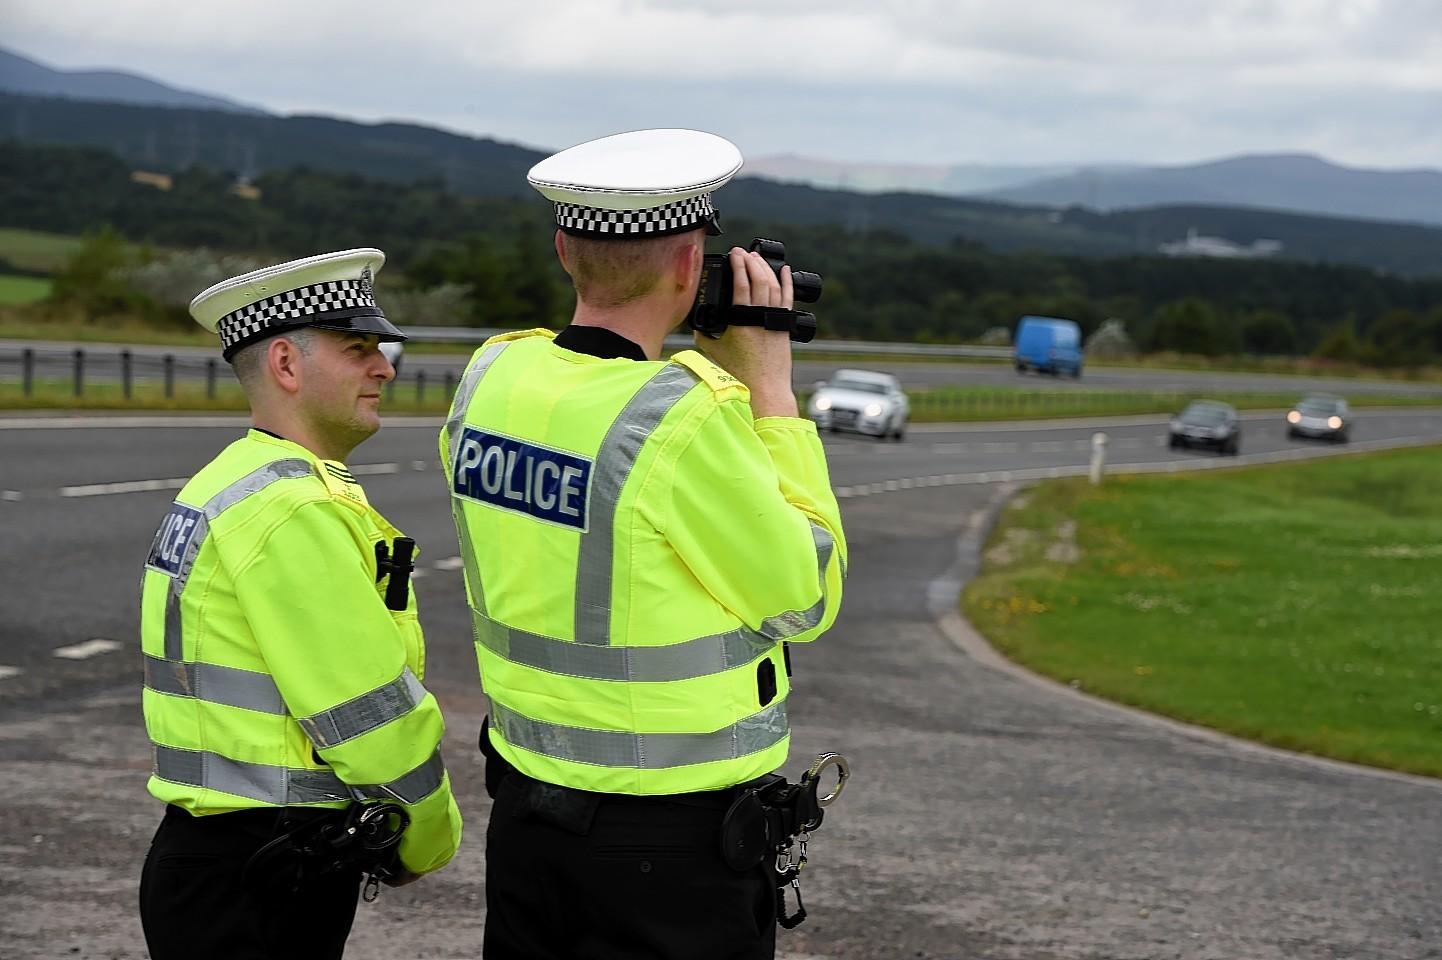 Police crackdown on speeders